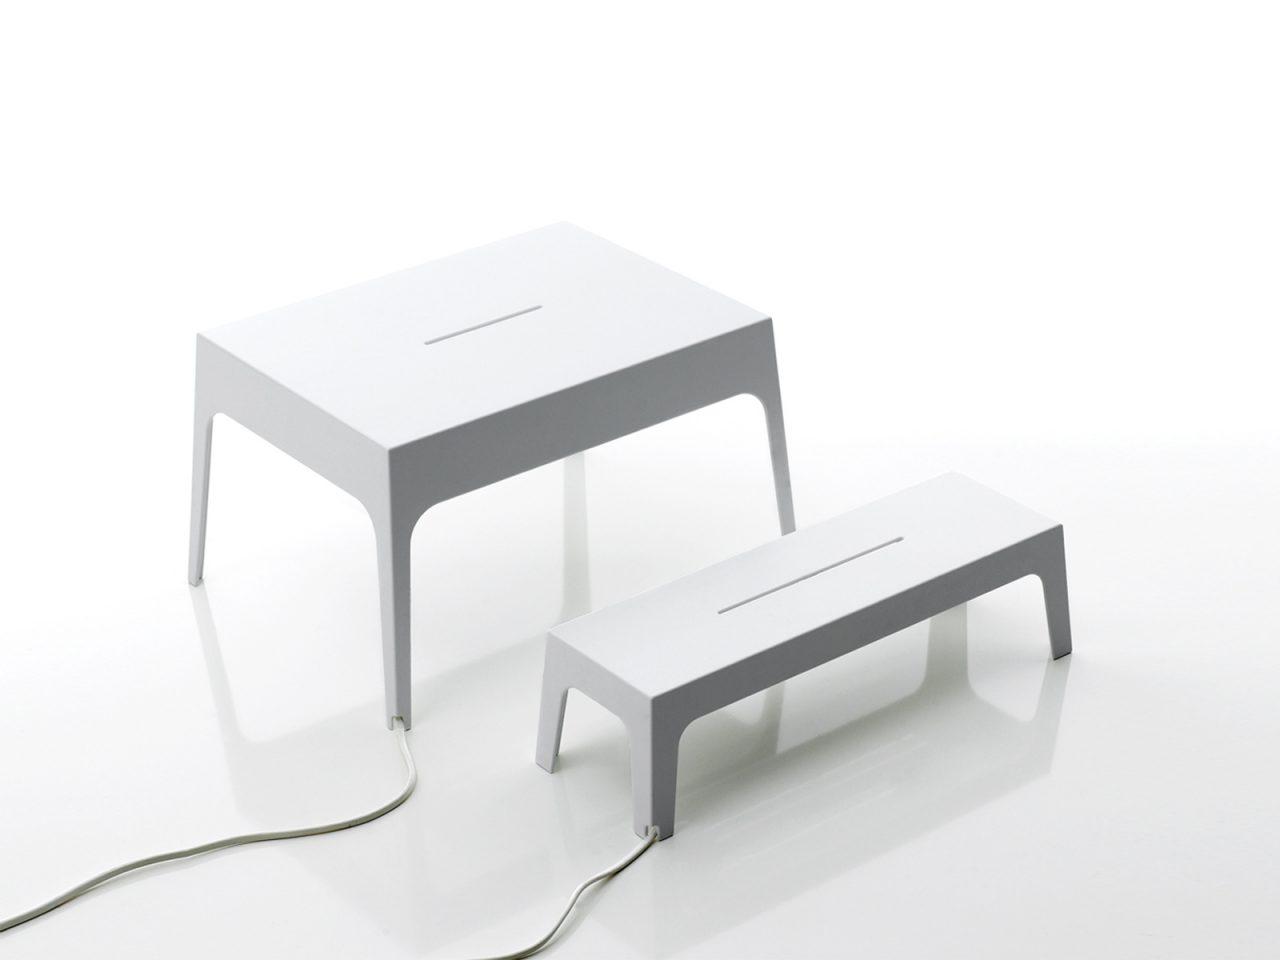 Zia and Zio Lamps by Sebastian Bergne